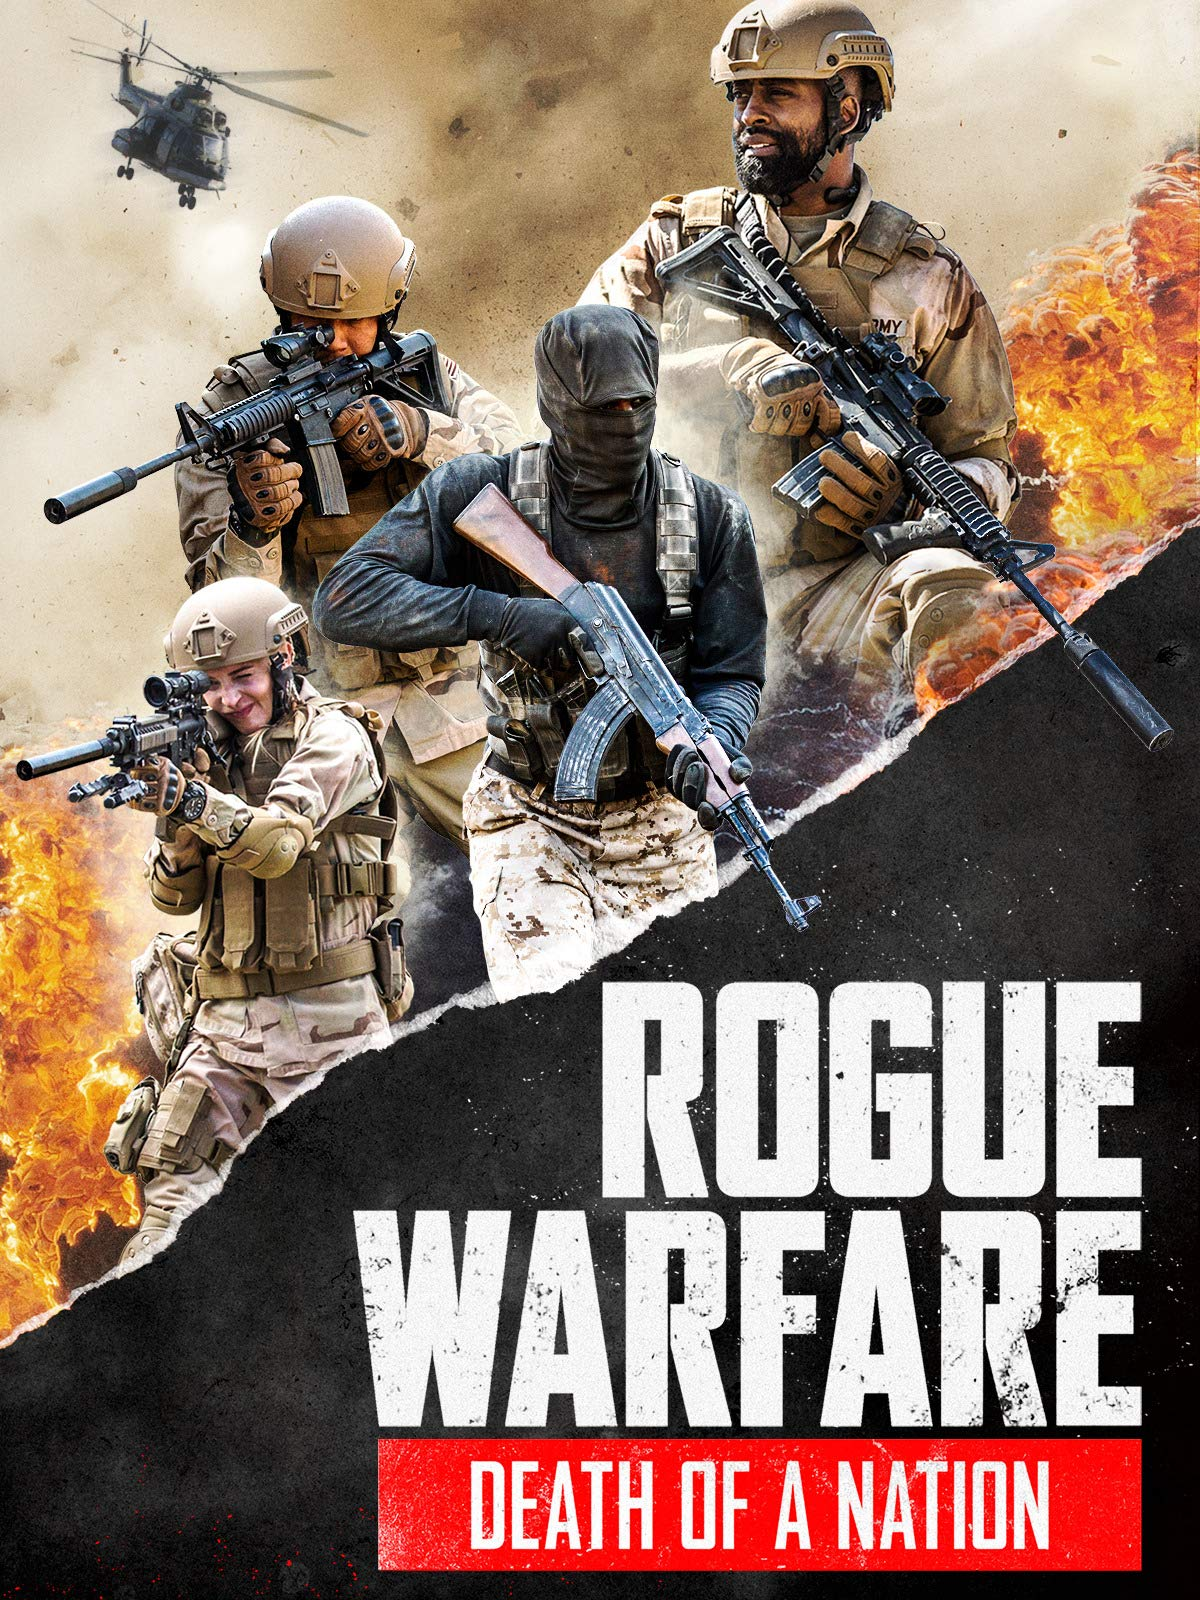 FOX MOVIES: ROGUE WARFARE DEATH OF A NATION